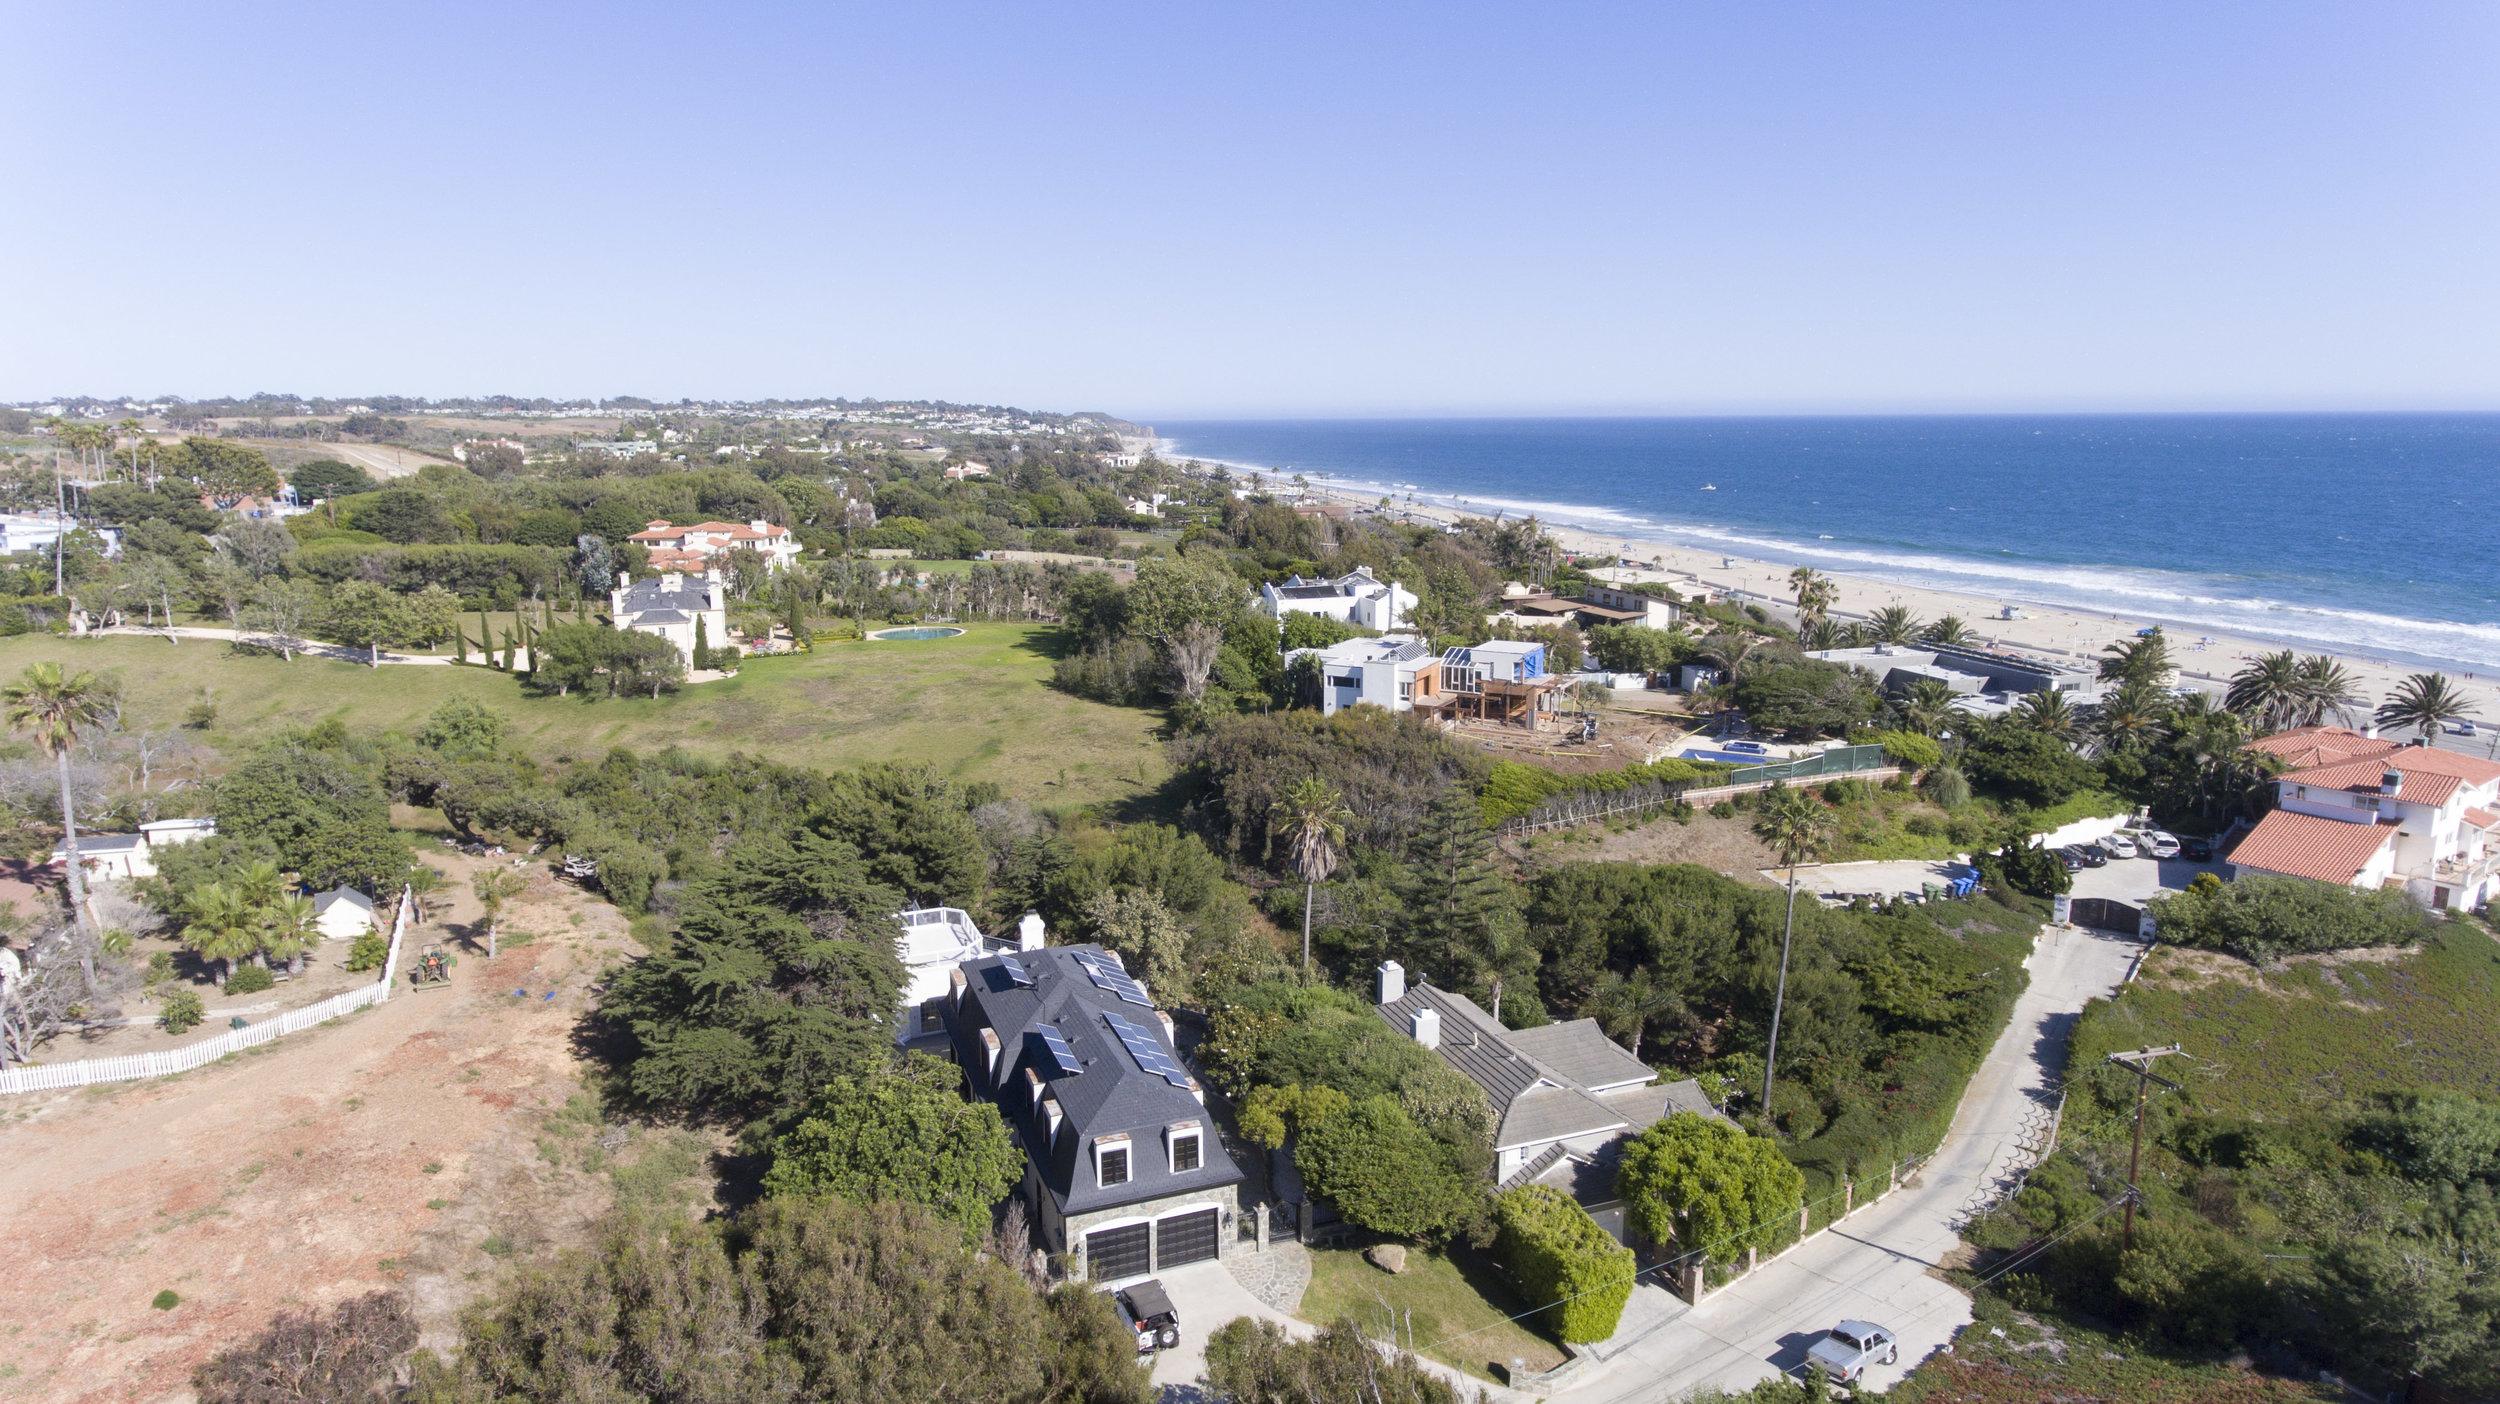 026 aerial 30340 Morning View Malibu For Sale The Malibu Life Team Luxury Real Estate.jpg